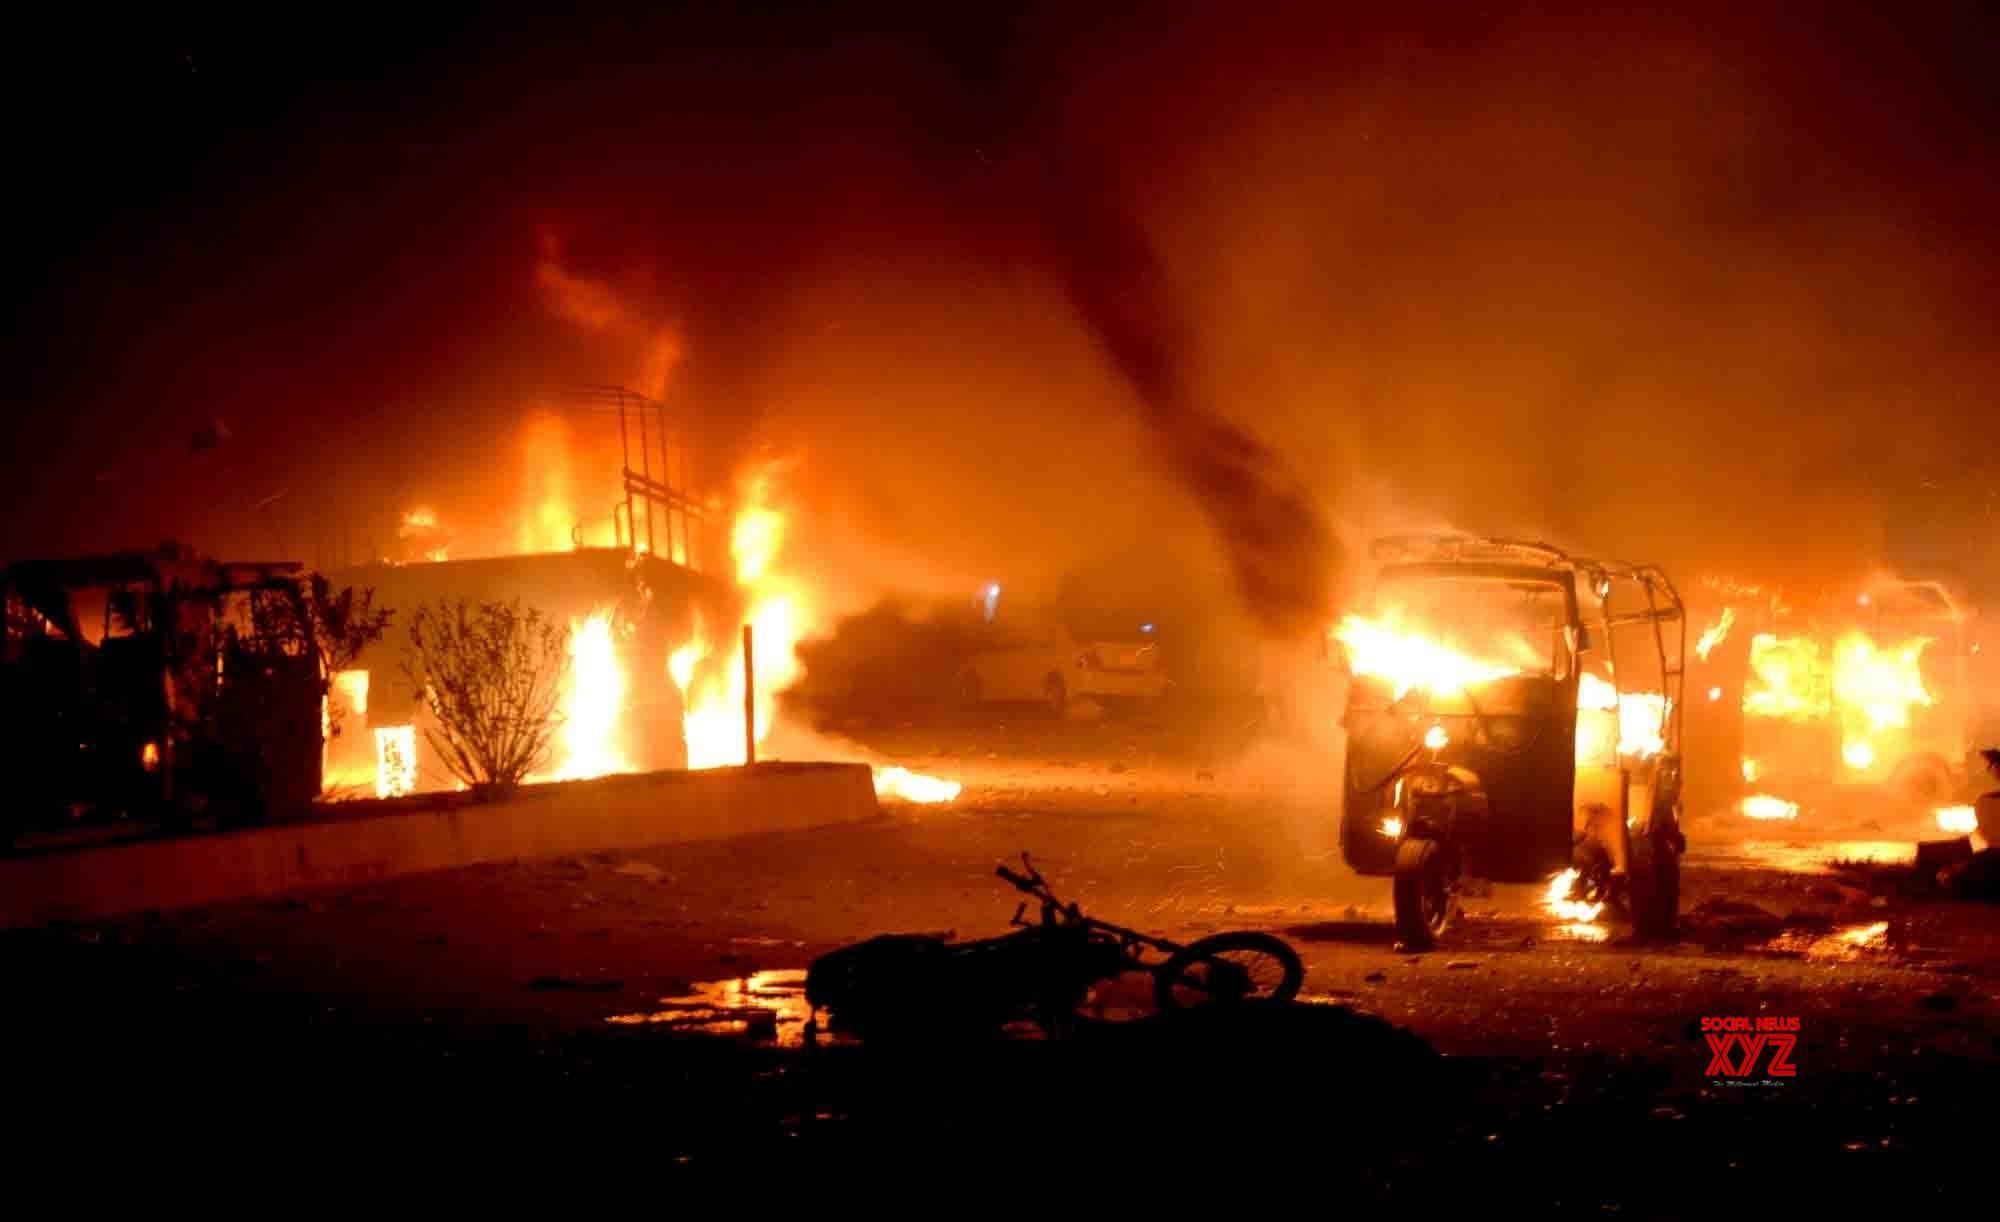 15 dead, 32 injured as blast hits army truck in Pakistan